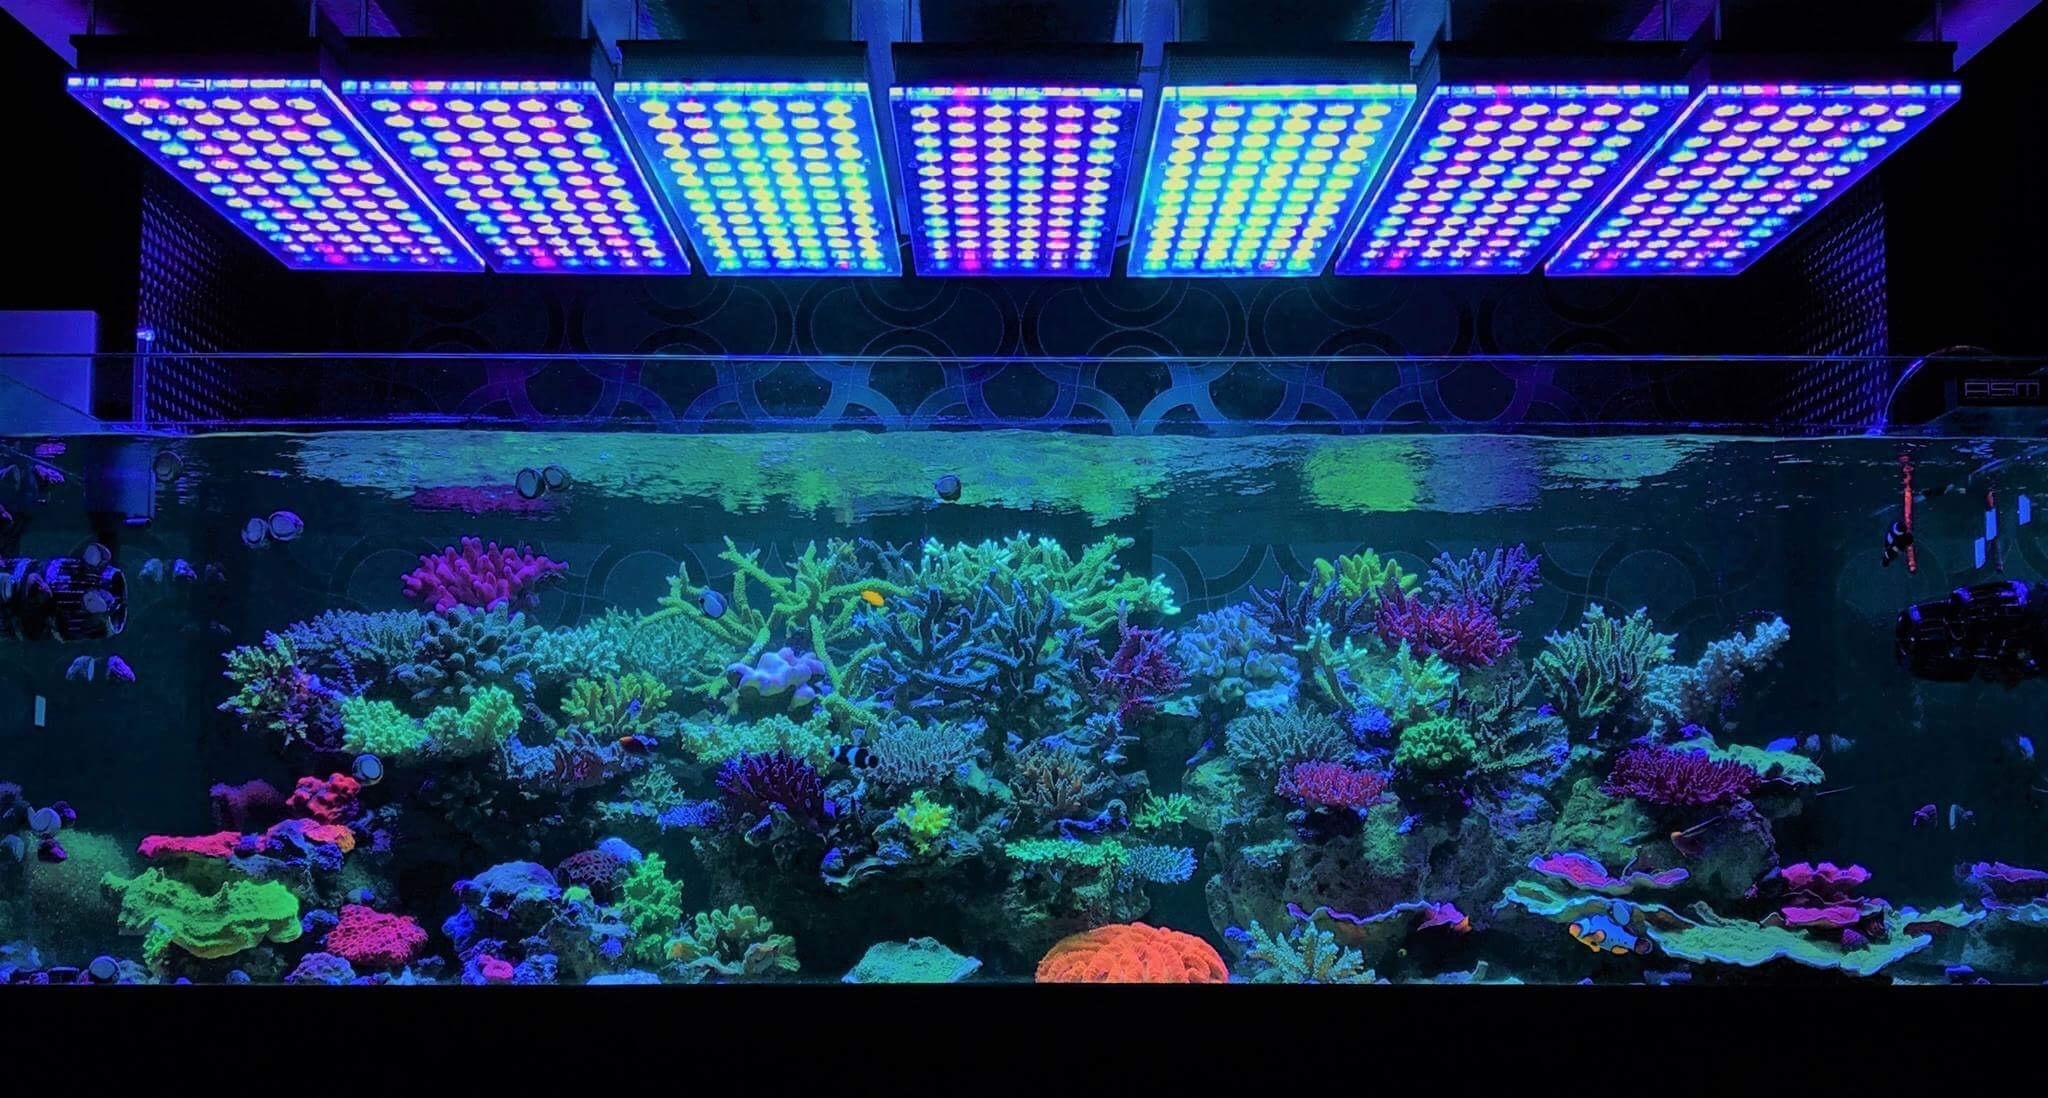 amazing japanese reef tank unter atlantik v4 led beleuchtung aquarium led beleuchtung orphek. Black Bedroom Furniture Sets. Home Design Ideas